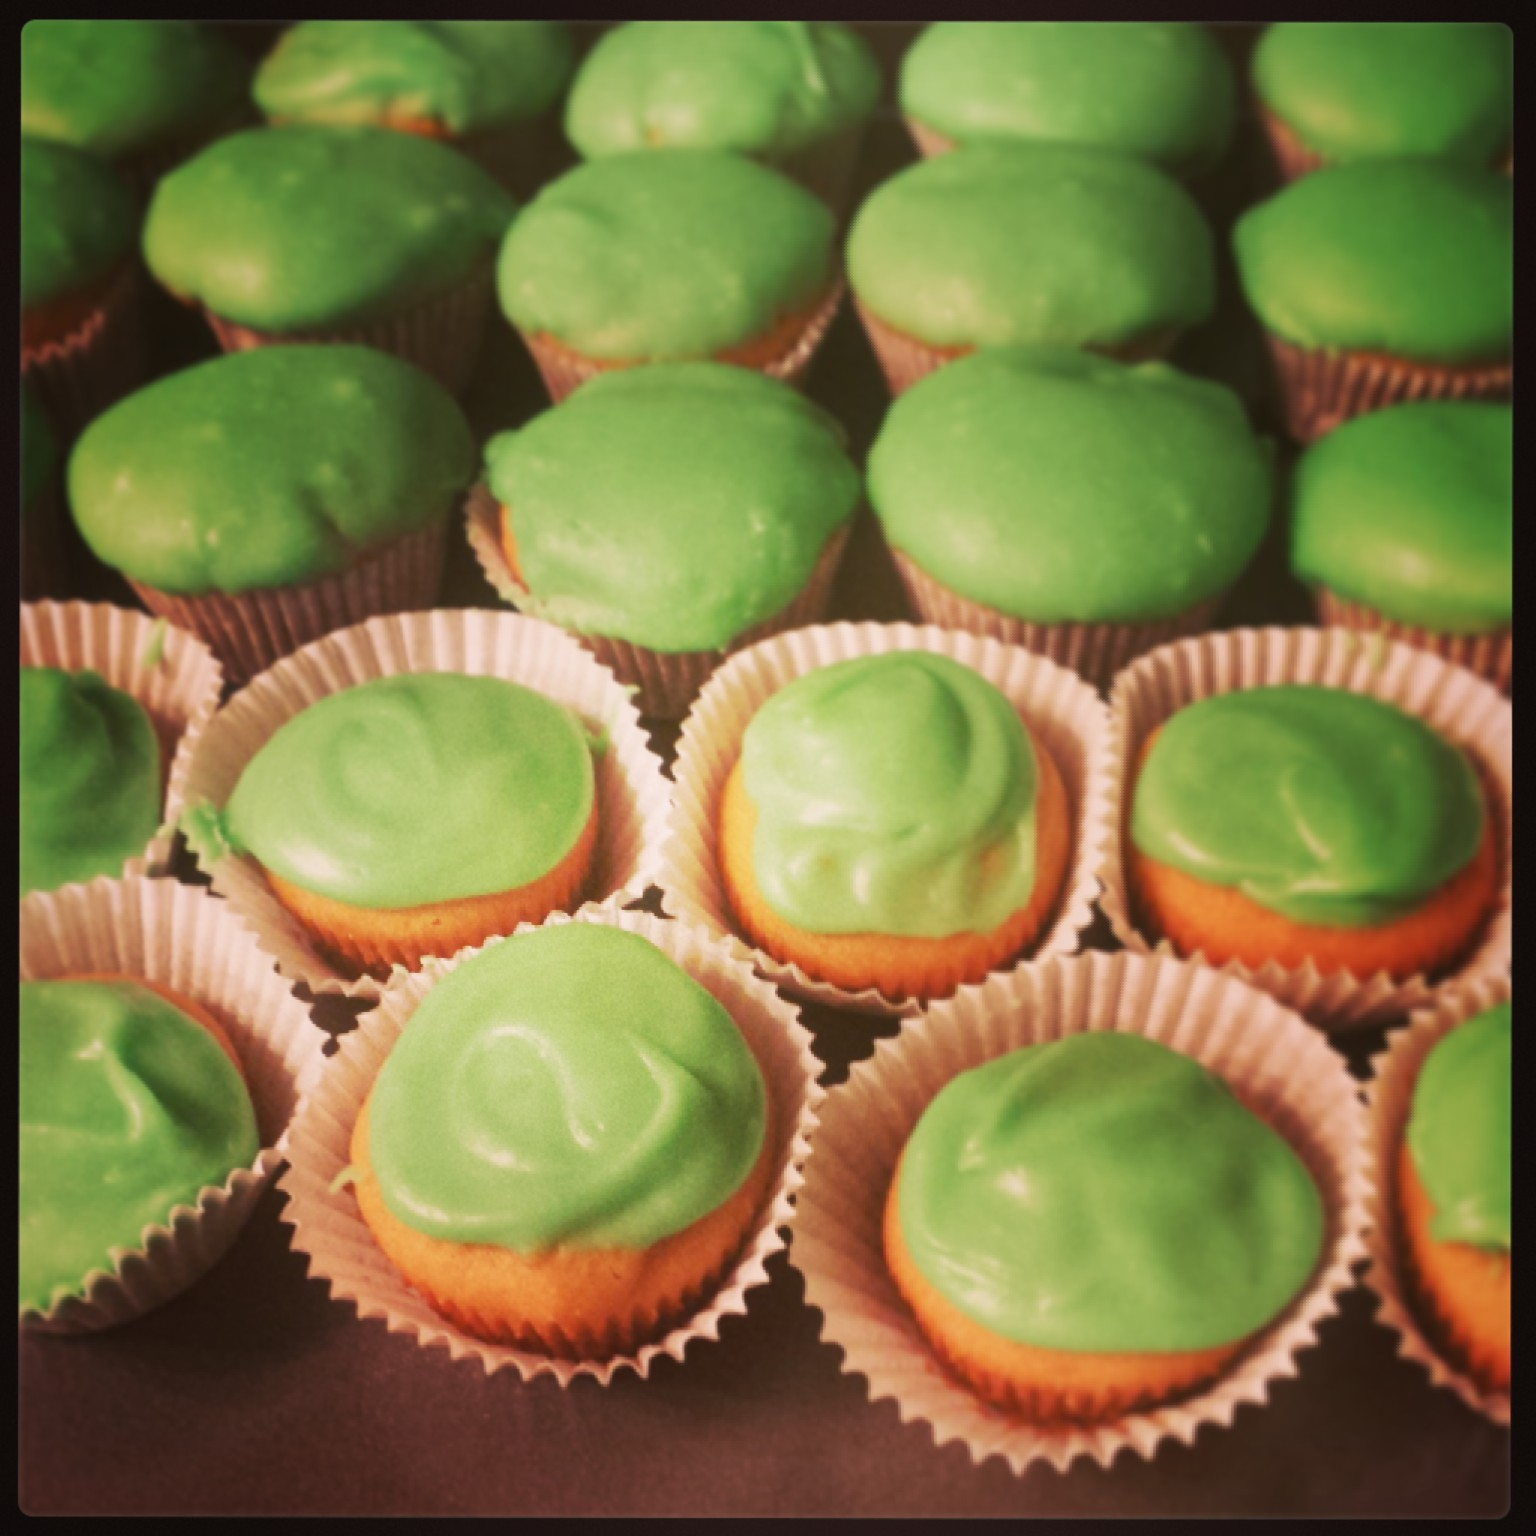 Herbalife+Birthday+Cake+Shake HERBALIFE CUPCAKES  Girl, InTransition